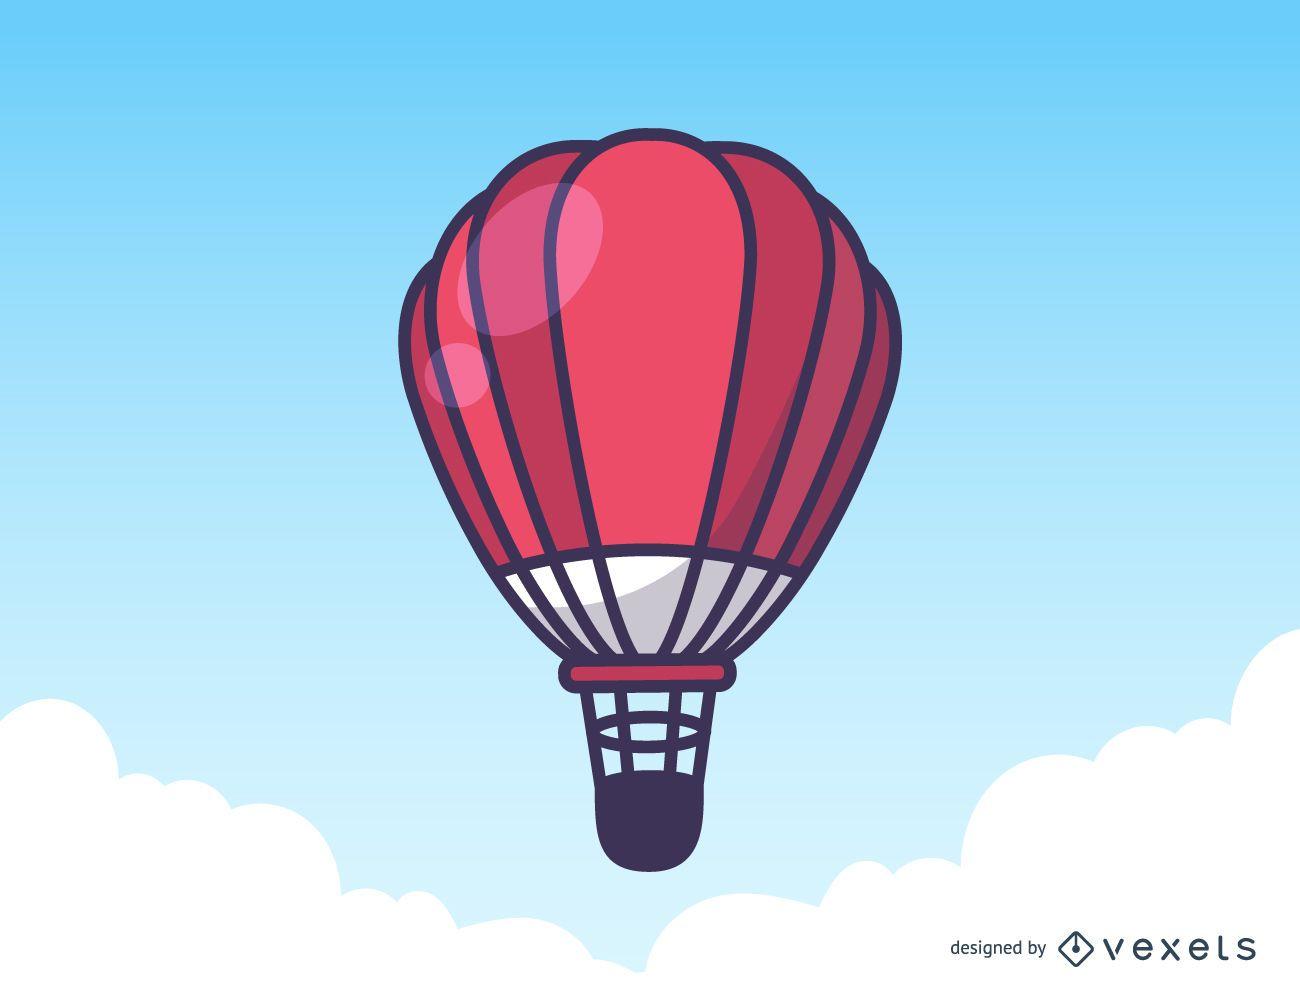 Red hot air balloon illustration